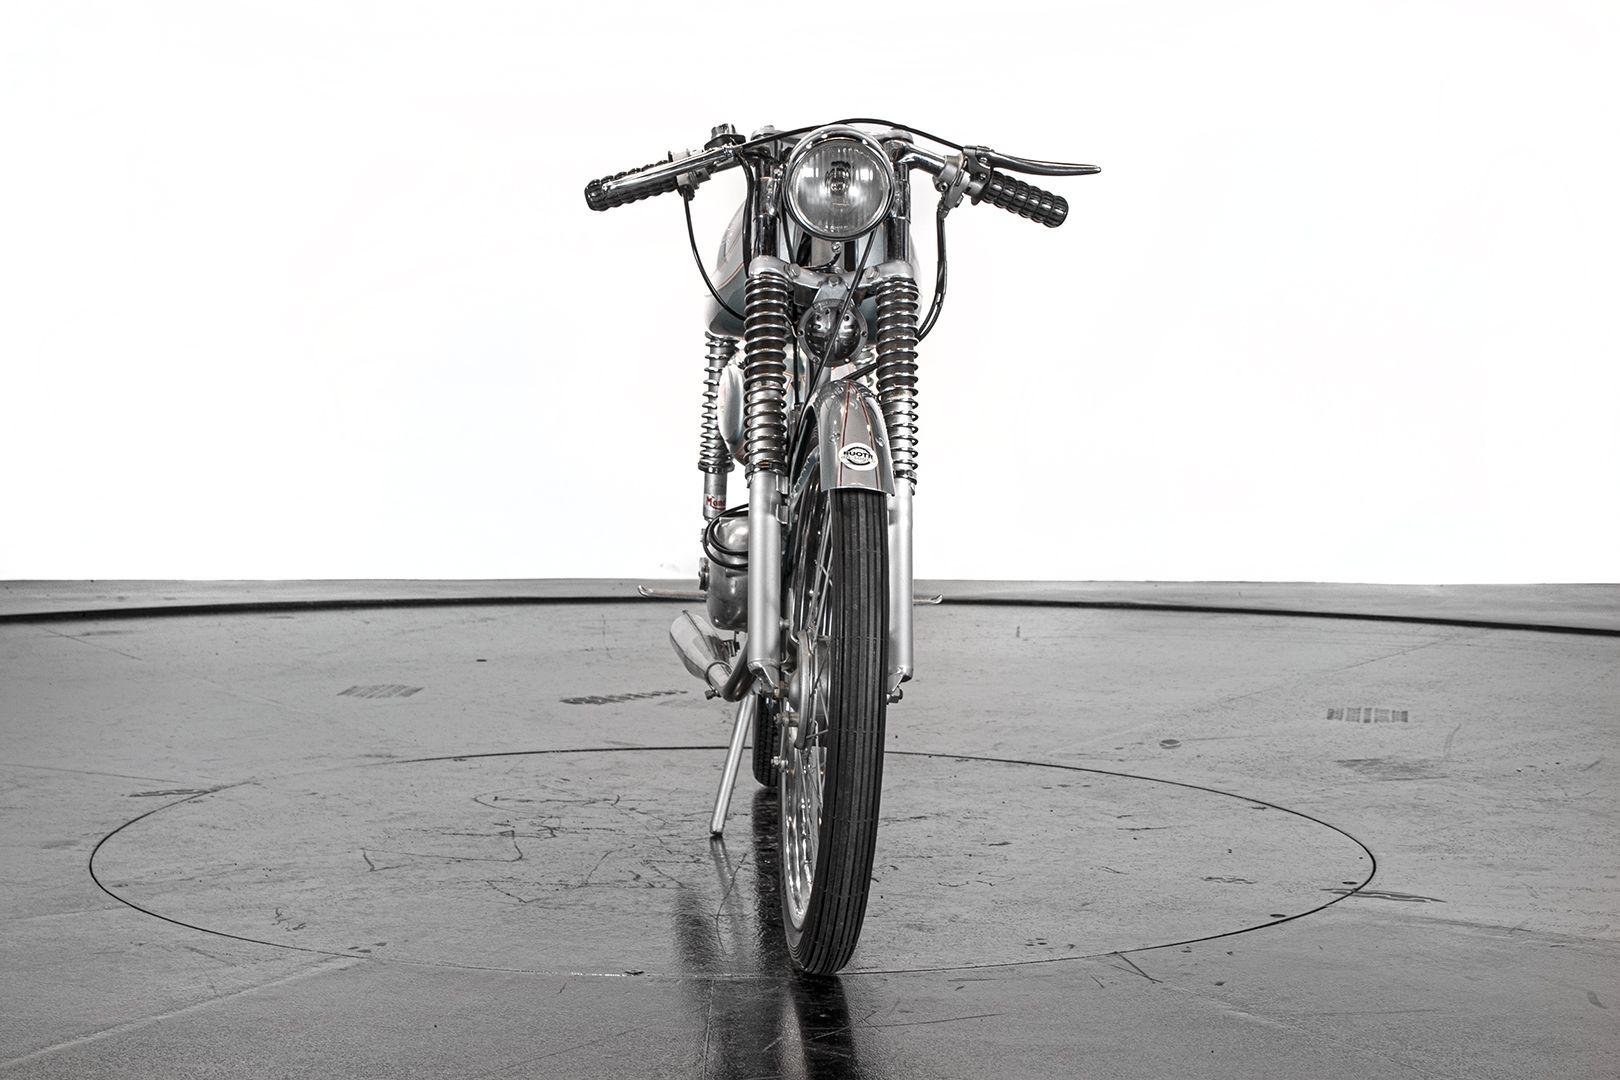 1972 Mondial Nova 61350